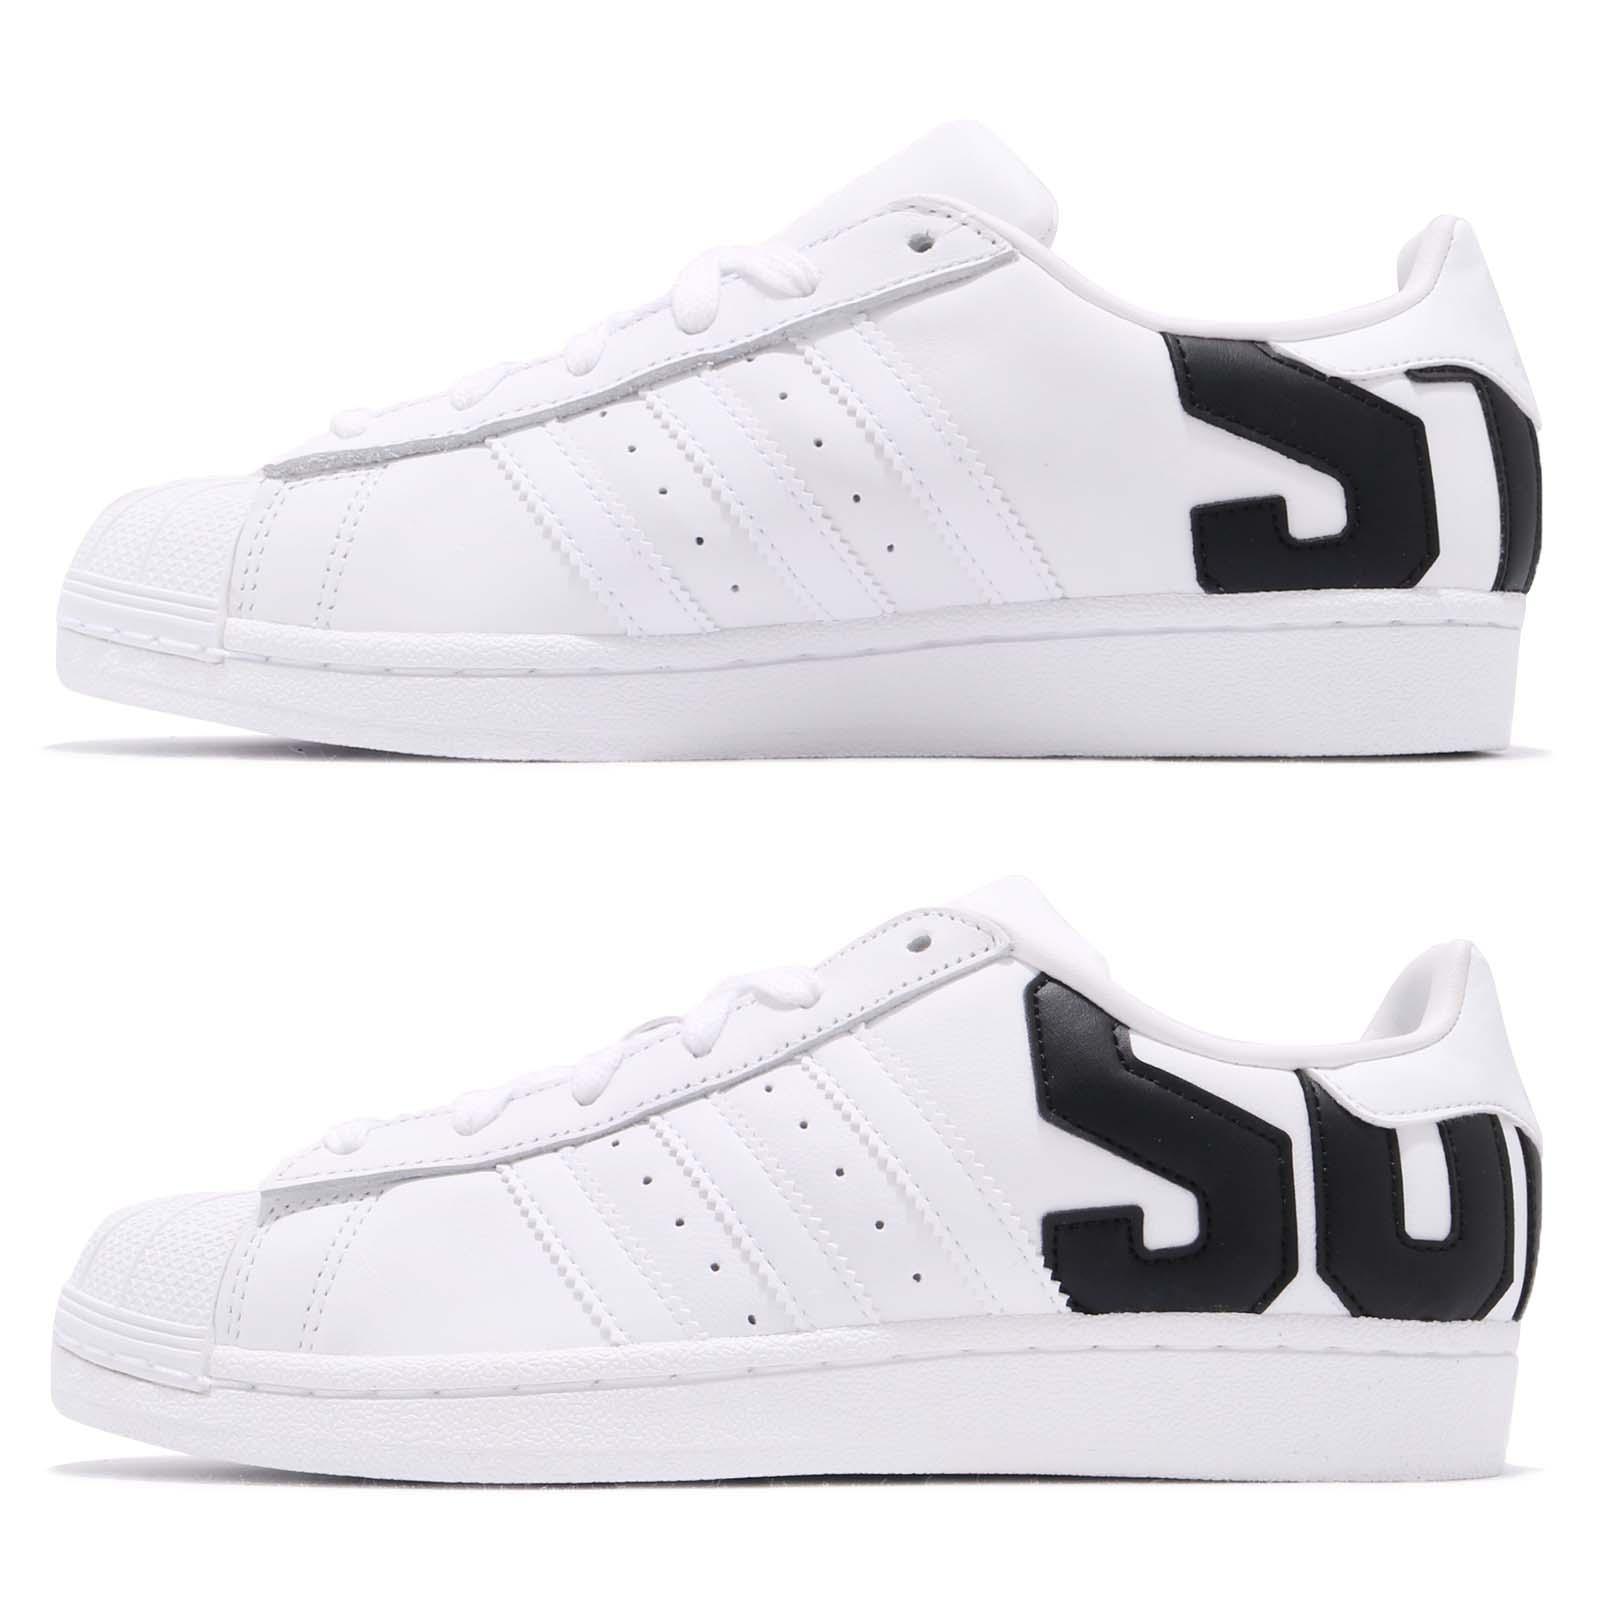 factory price 696df 70097 adidas Originals Superstar Big Logo White Black Men Women Casual Shoes  B37978